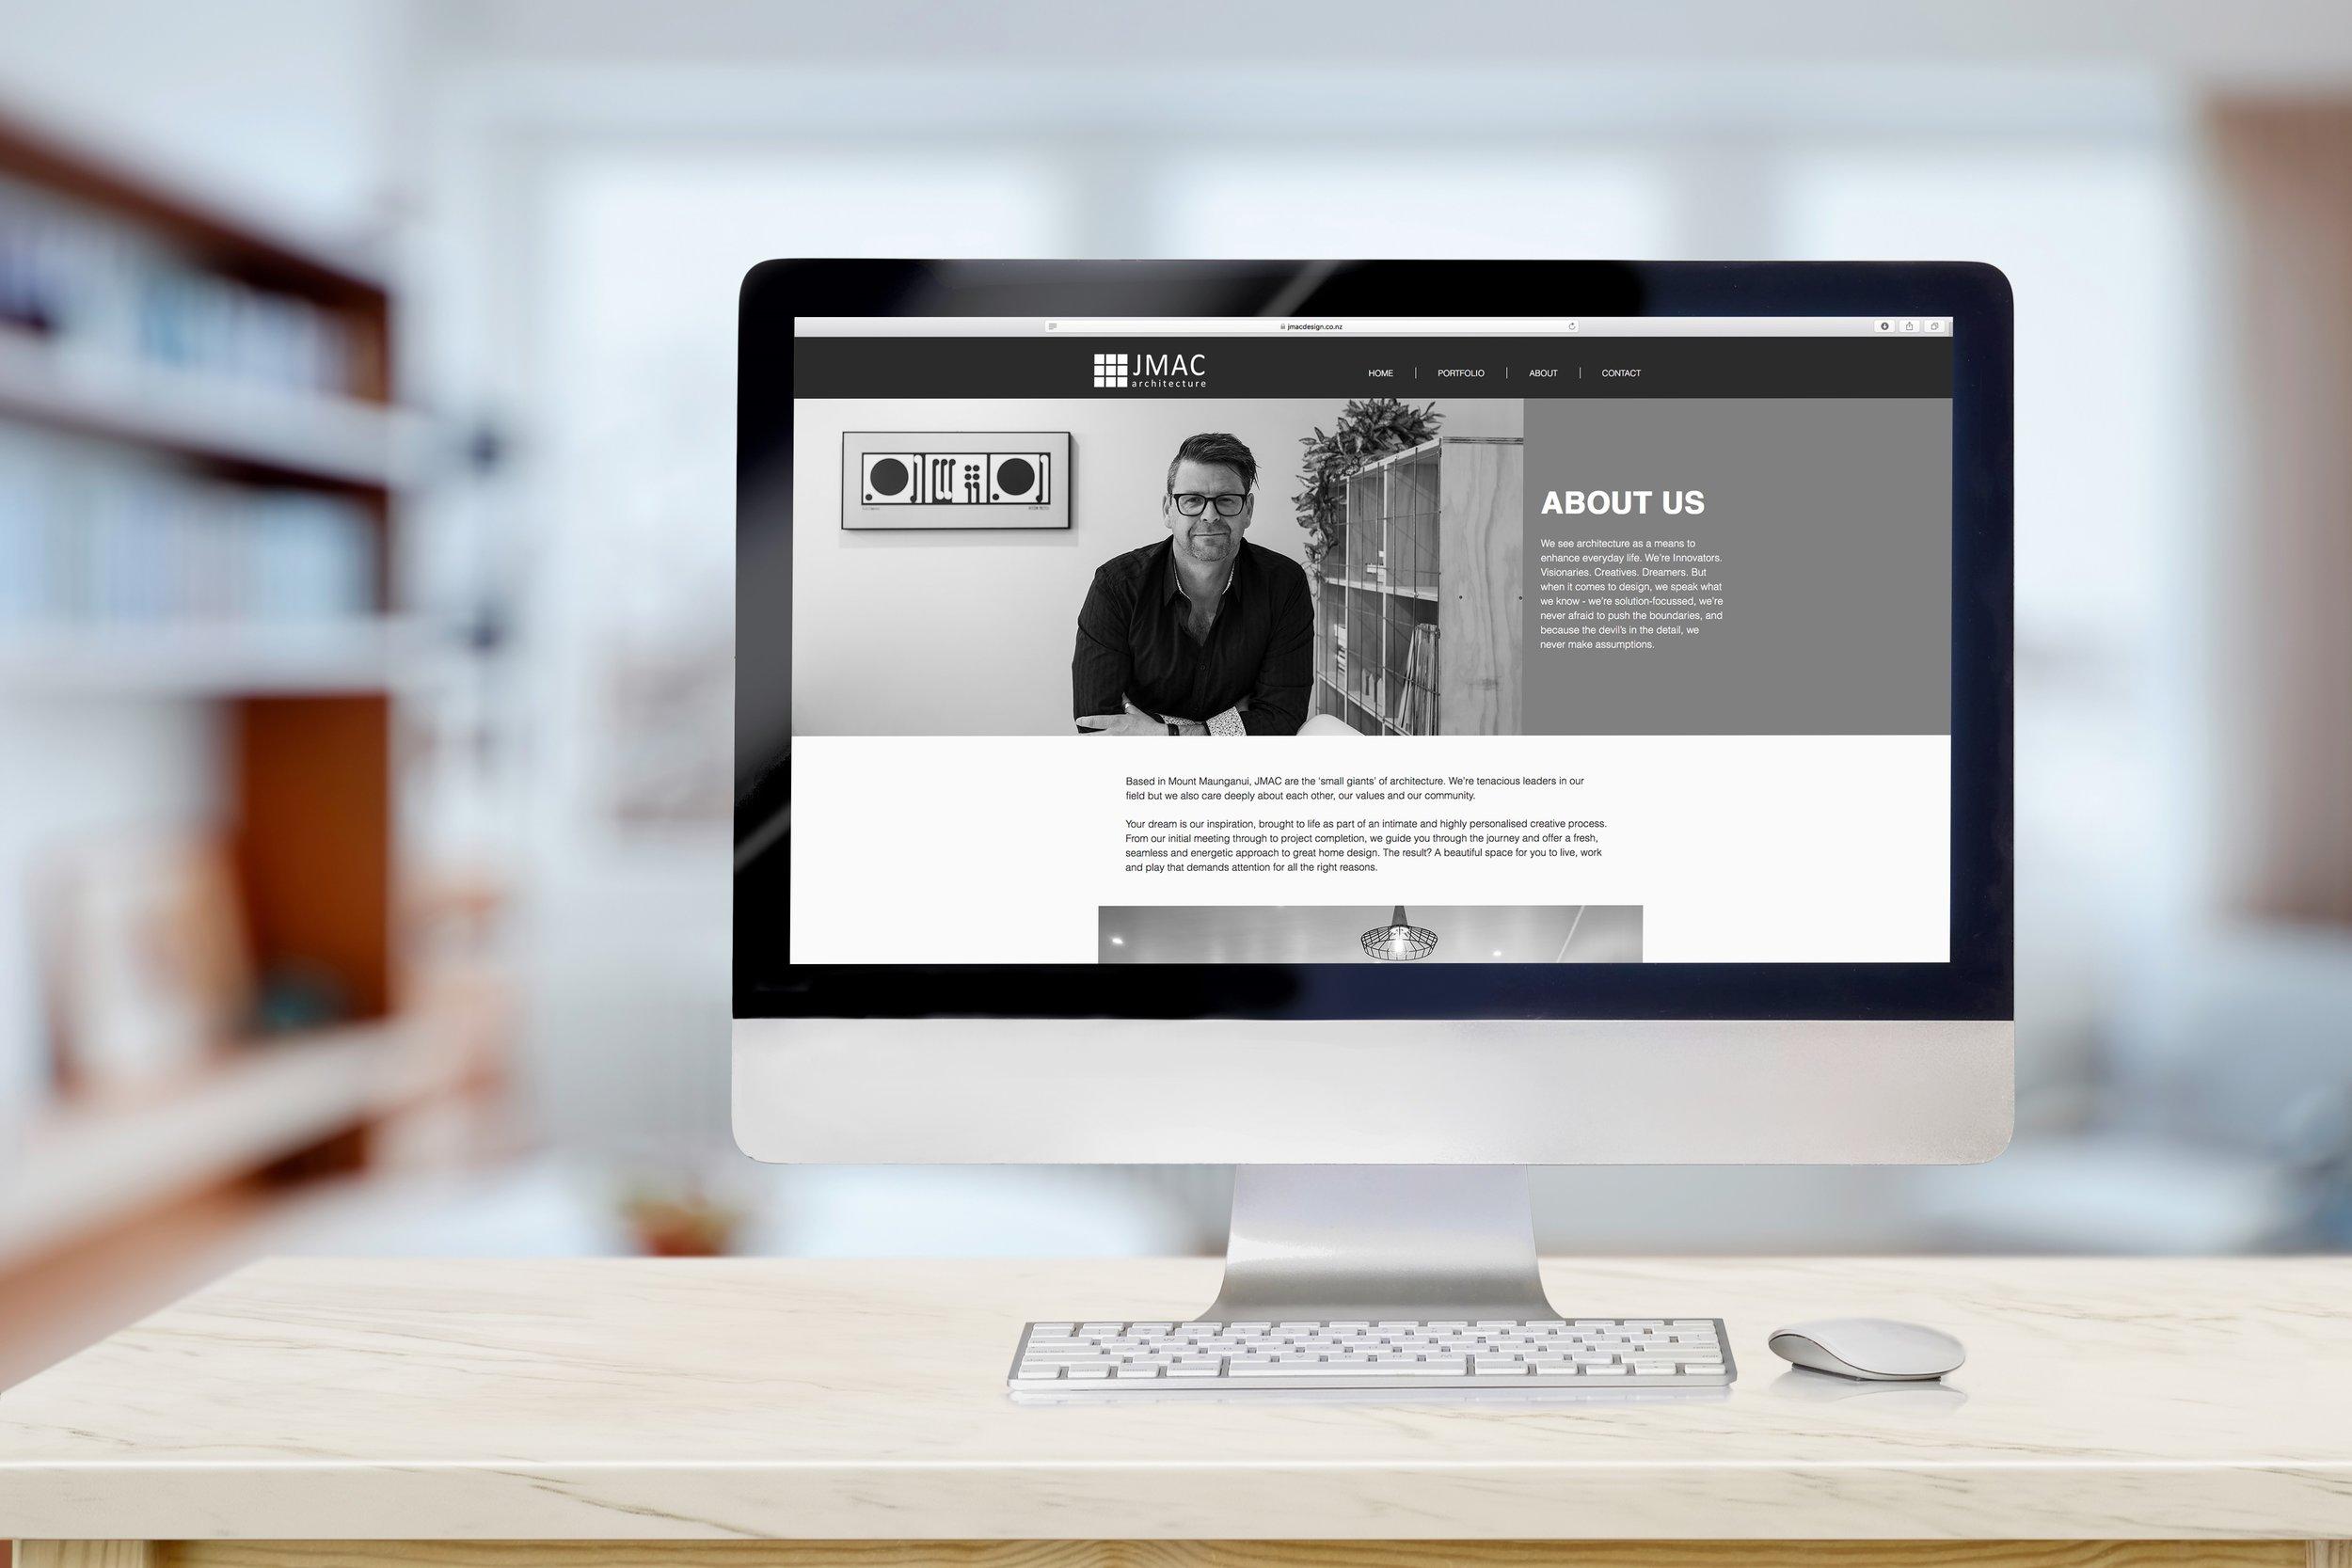 Laura-Tuck-Tide-Studio-Copywriting-JMAC-Architecture-website-copywriting